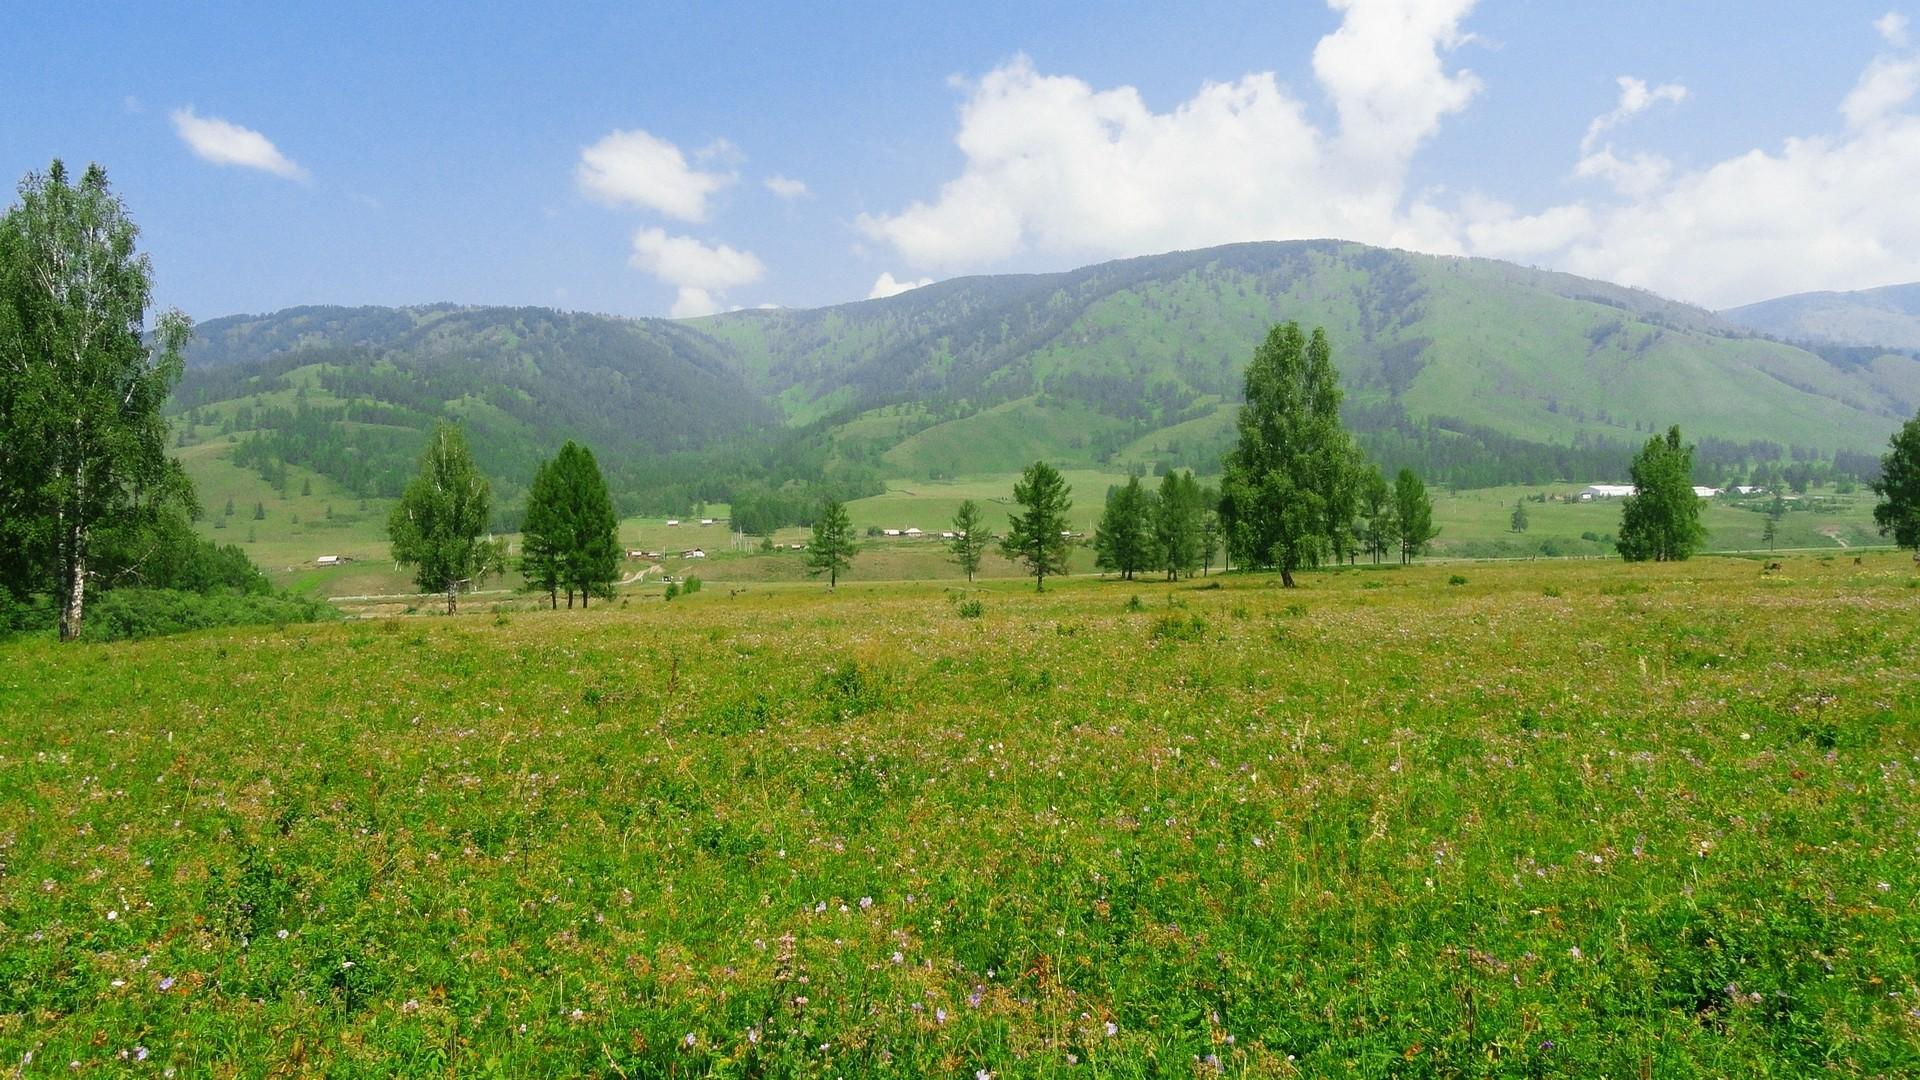 Russia grass hills landscapes nature wallpaper wallpapers for Grass landscape